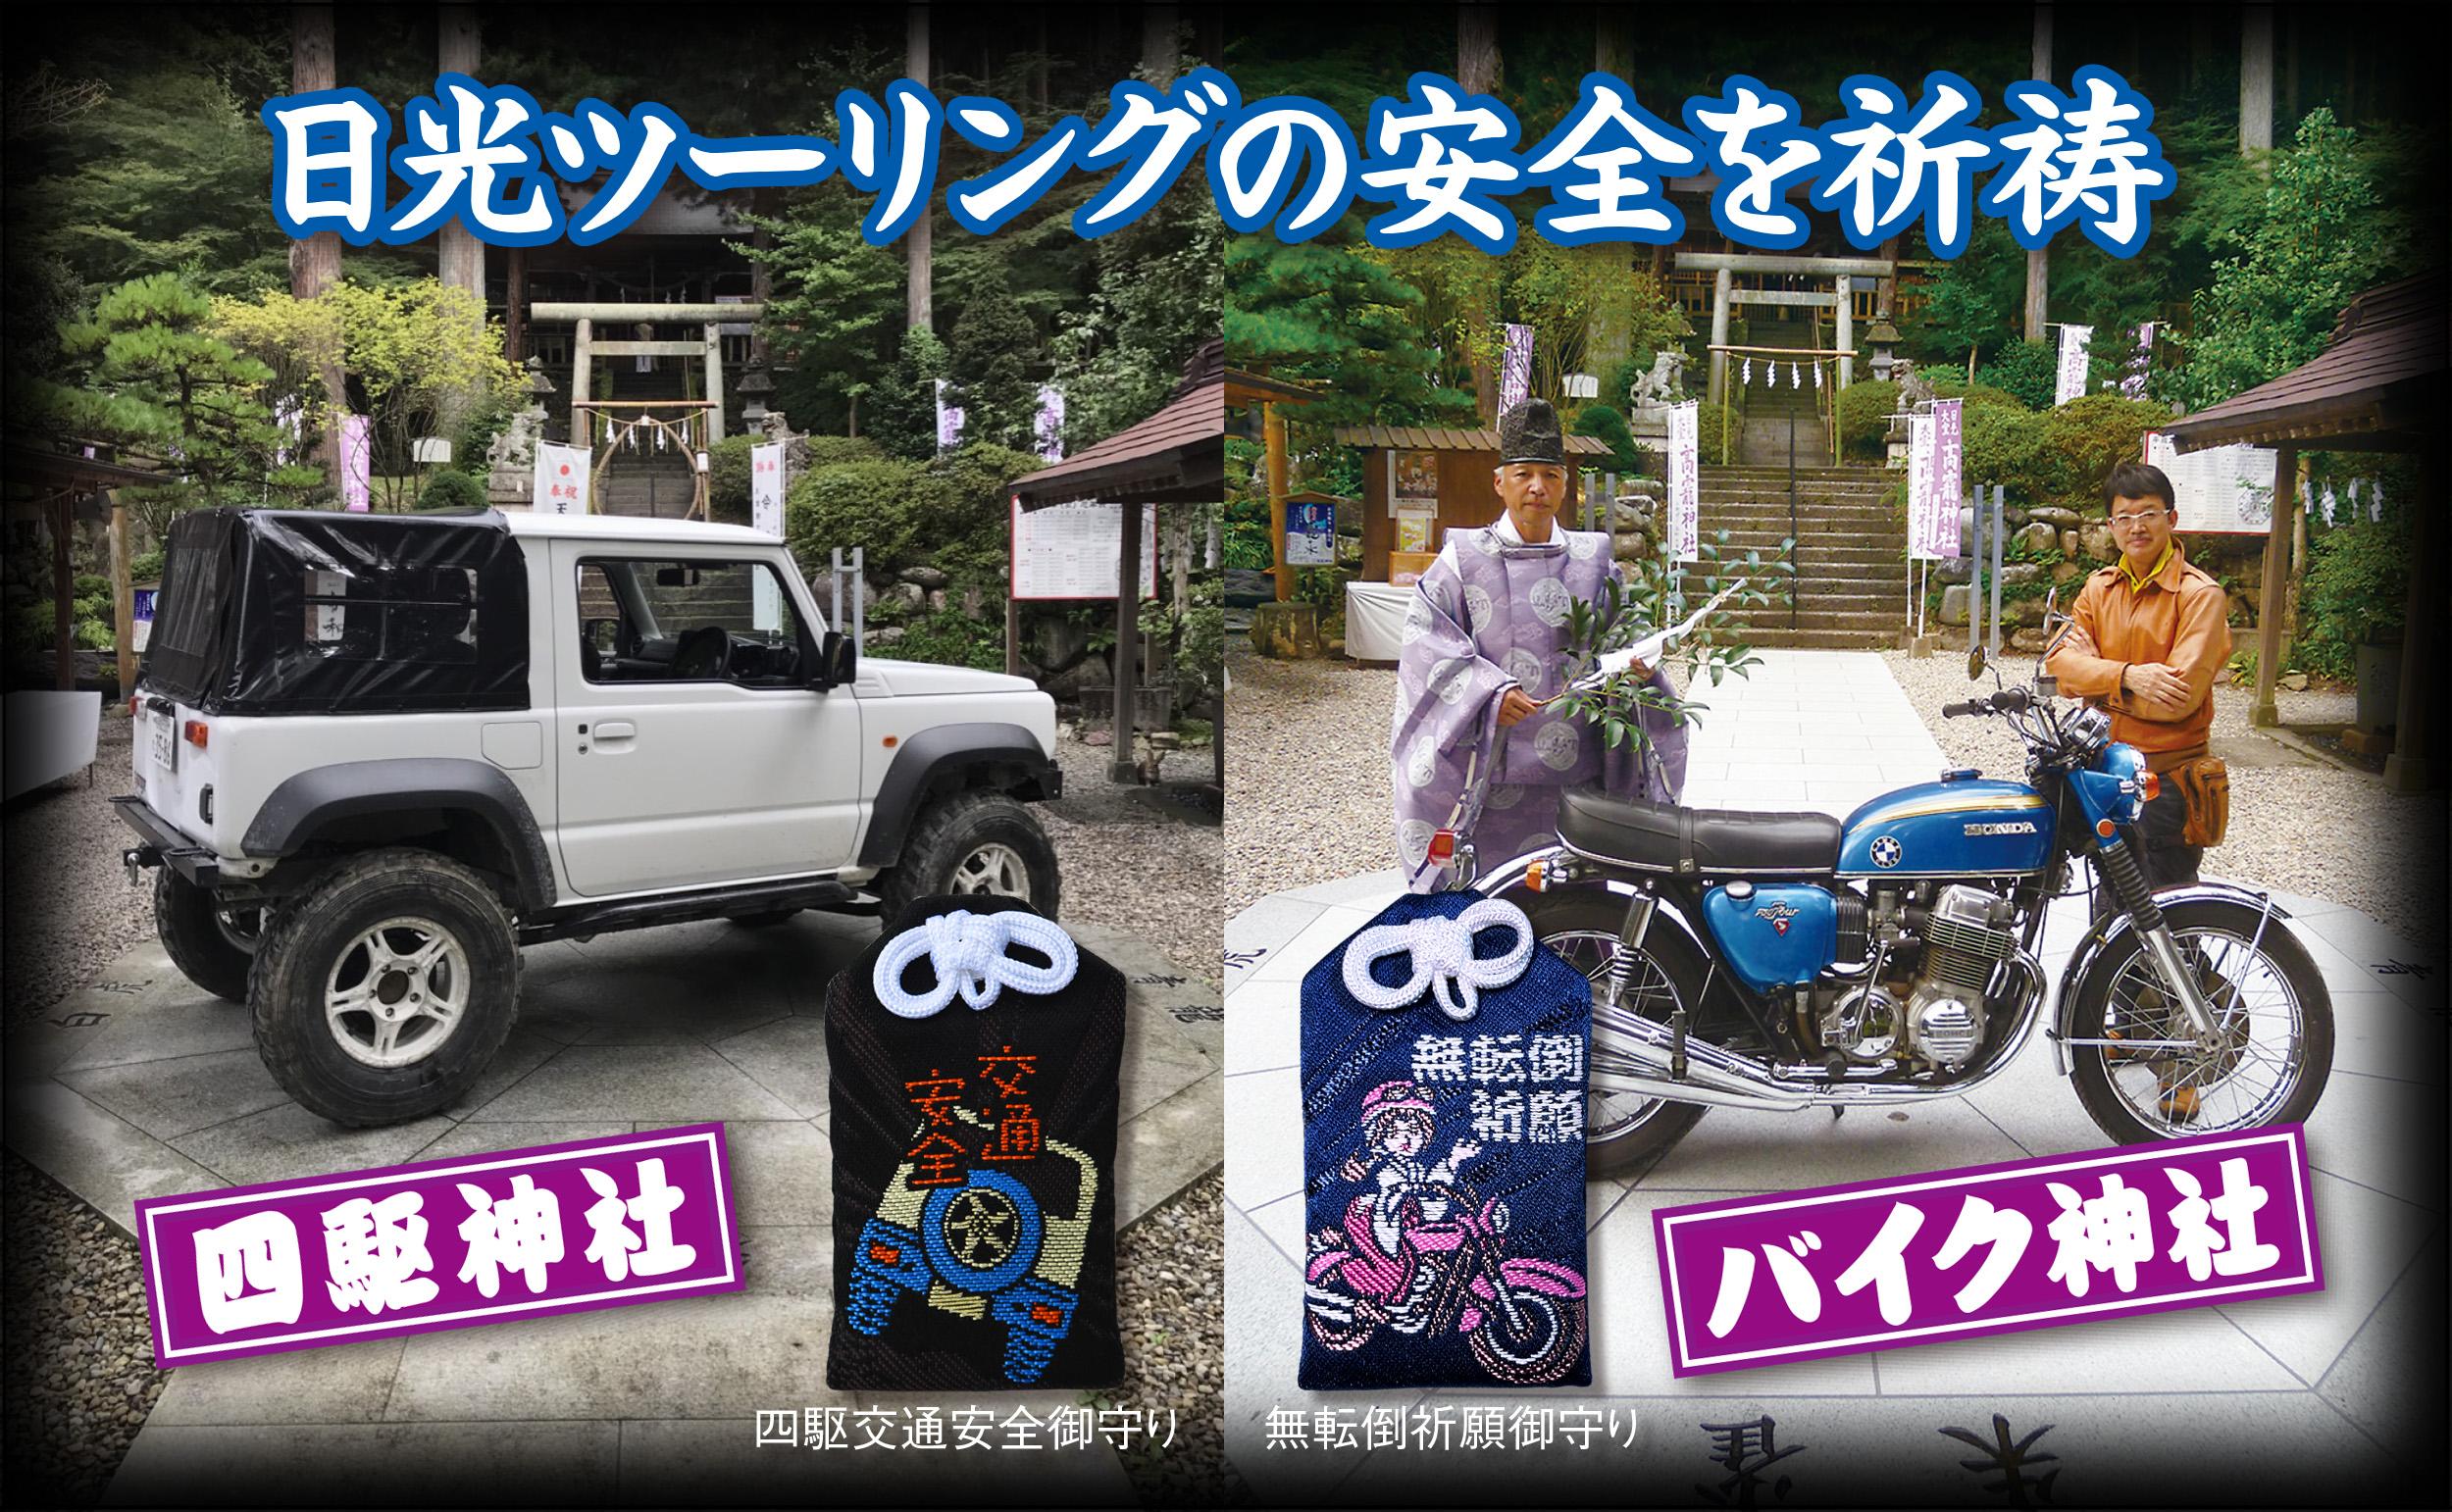 HP用トップページ2019_四駆・バイク神社